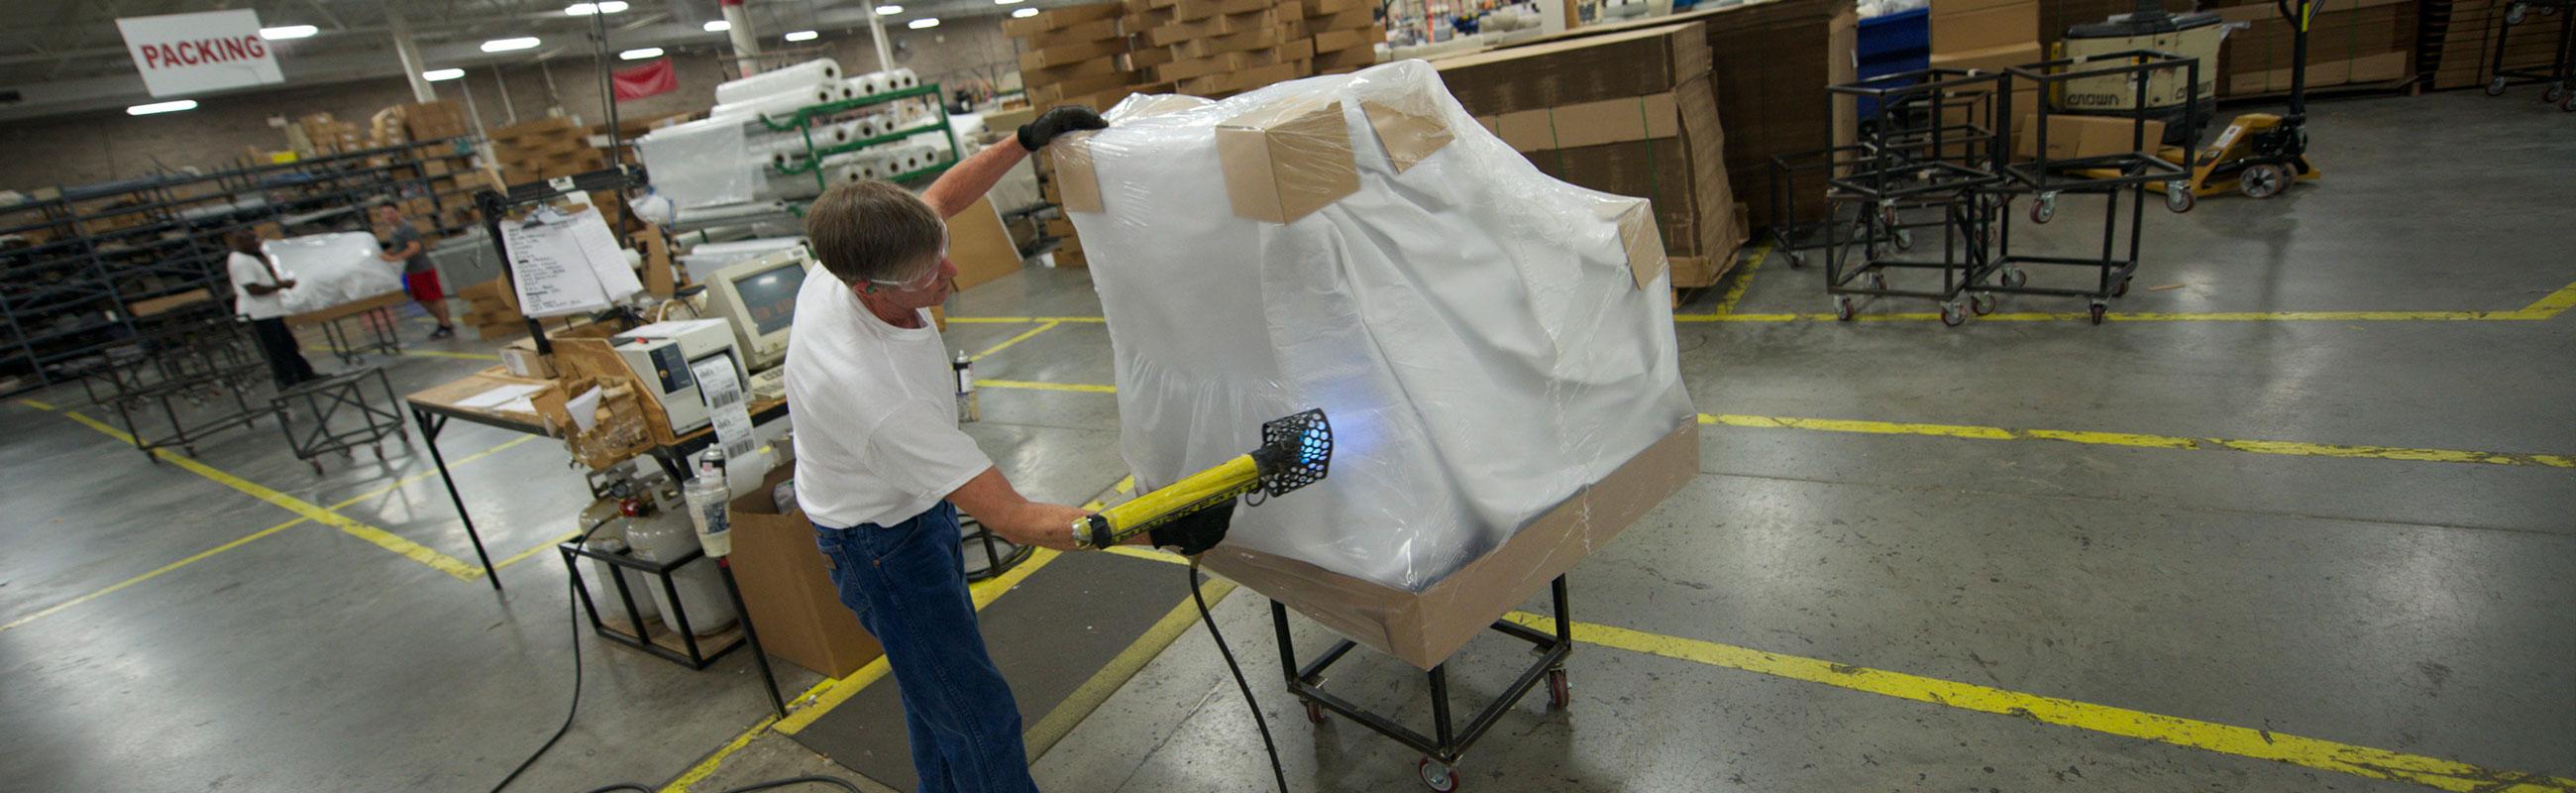 Shrink fast gun furniture packaging